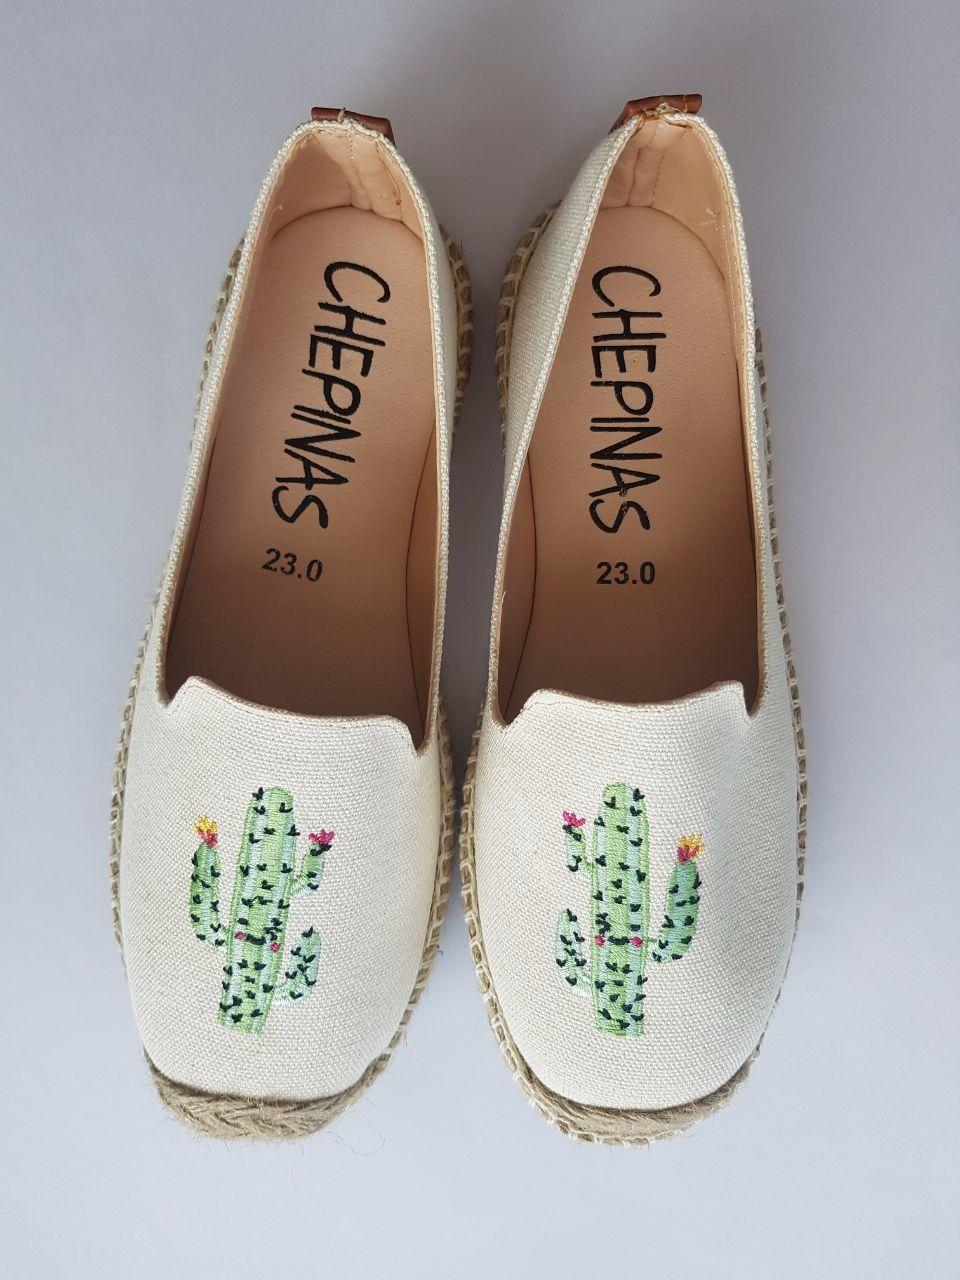 Cactus | Cactus | Cactus, Cactus art, Fashion